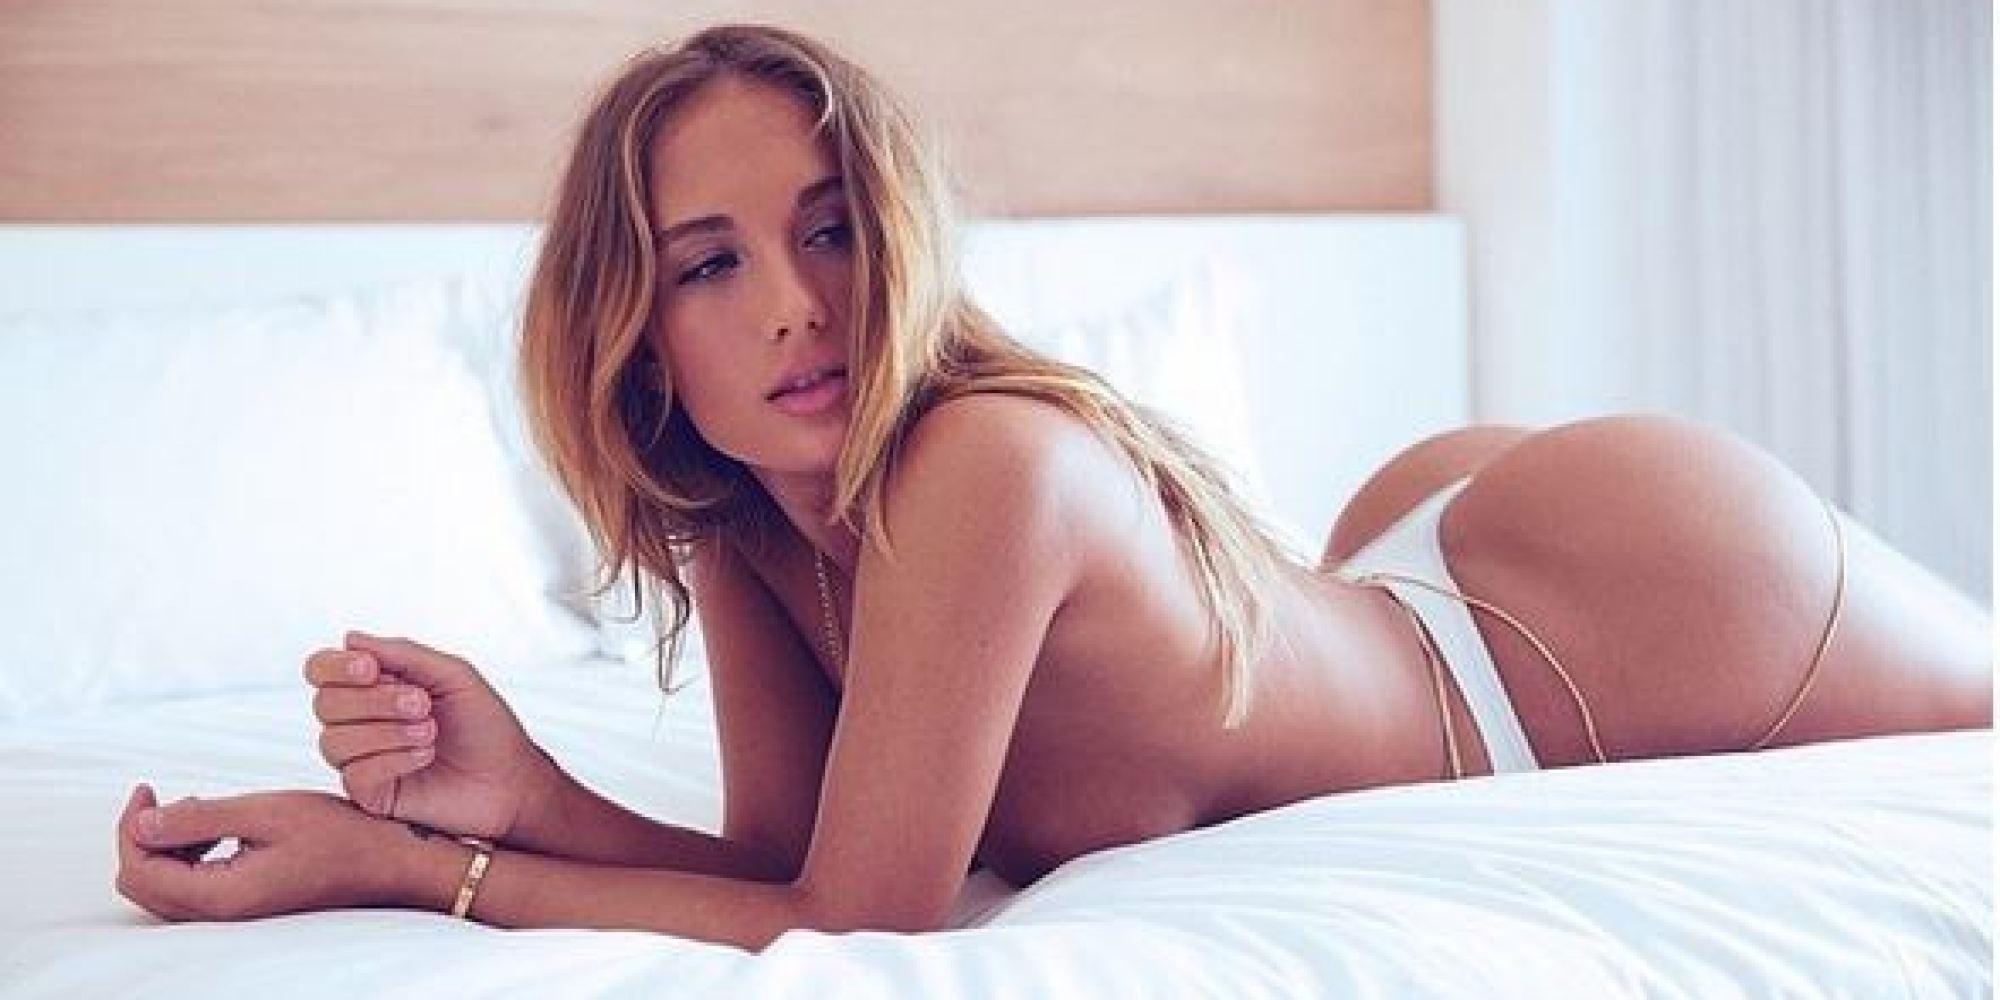 girls like sex personal escort